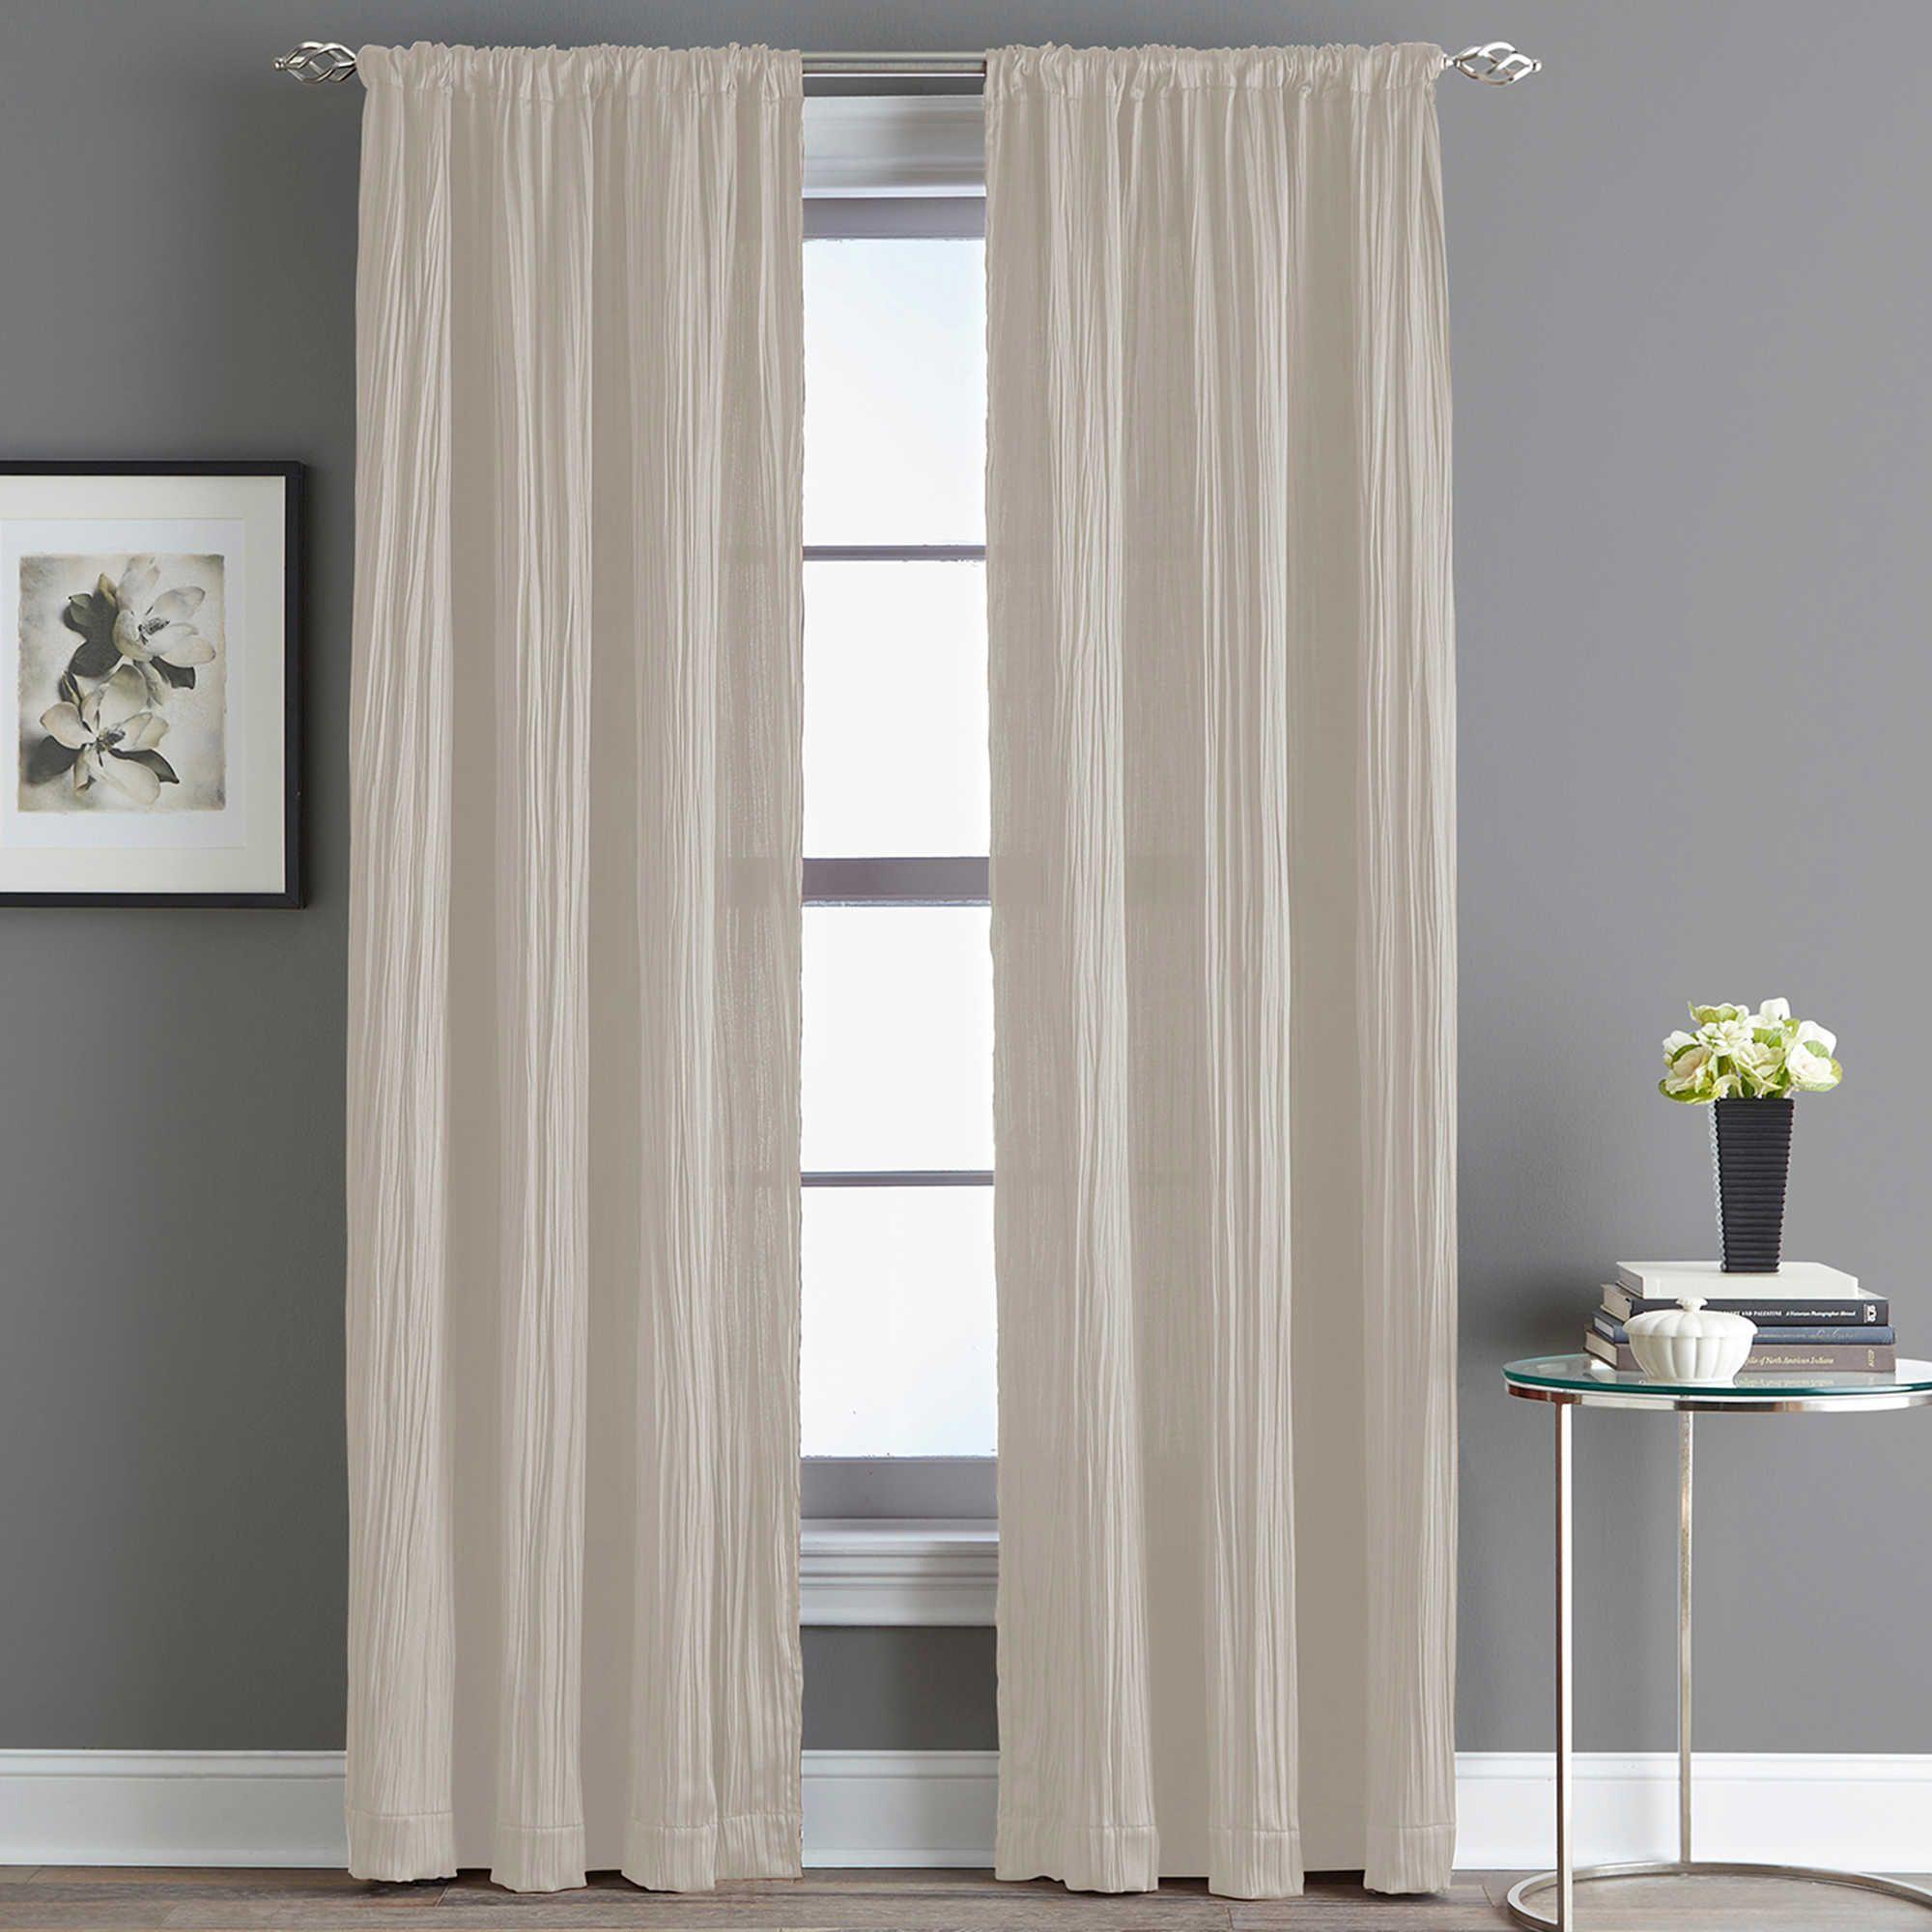 Fortuna Room Darkening Rod Pocket 63 Inch Window Curtain Panel In